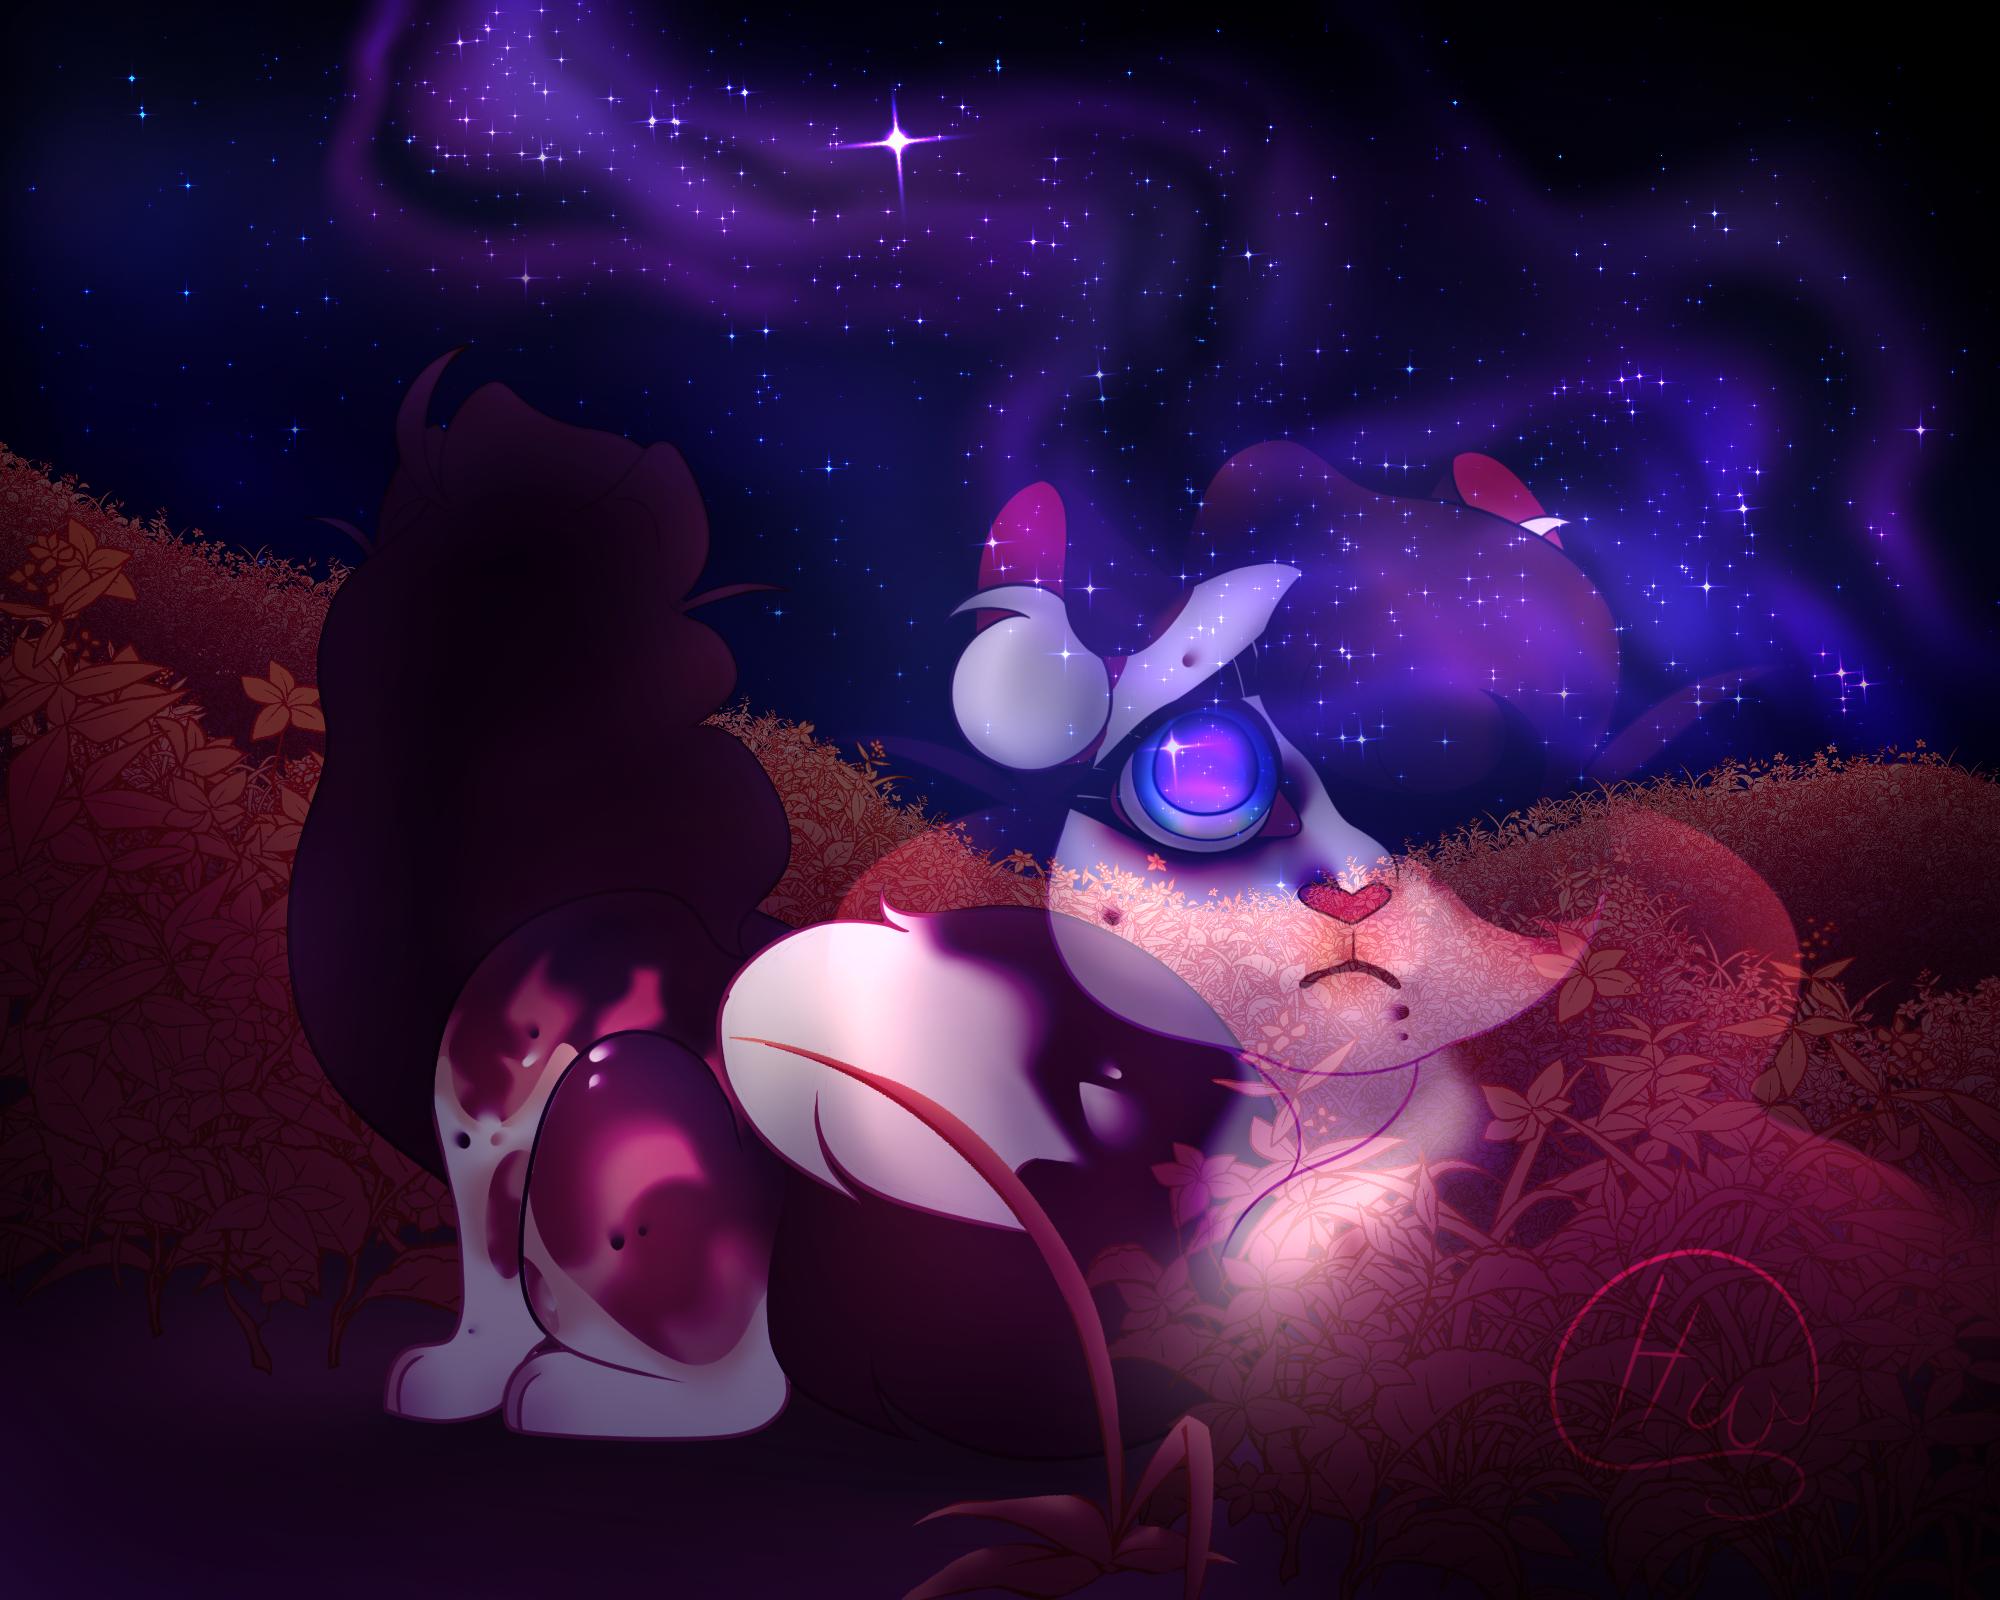 Stargazing_3.png